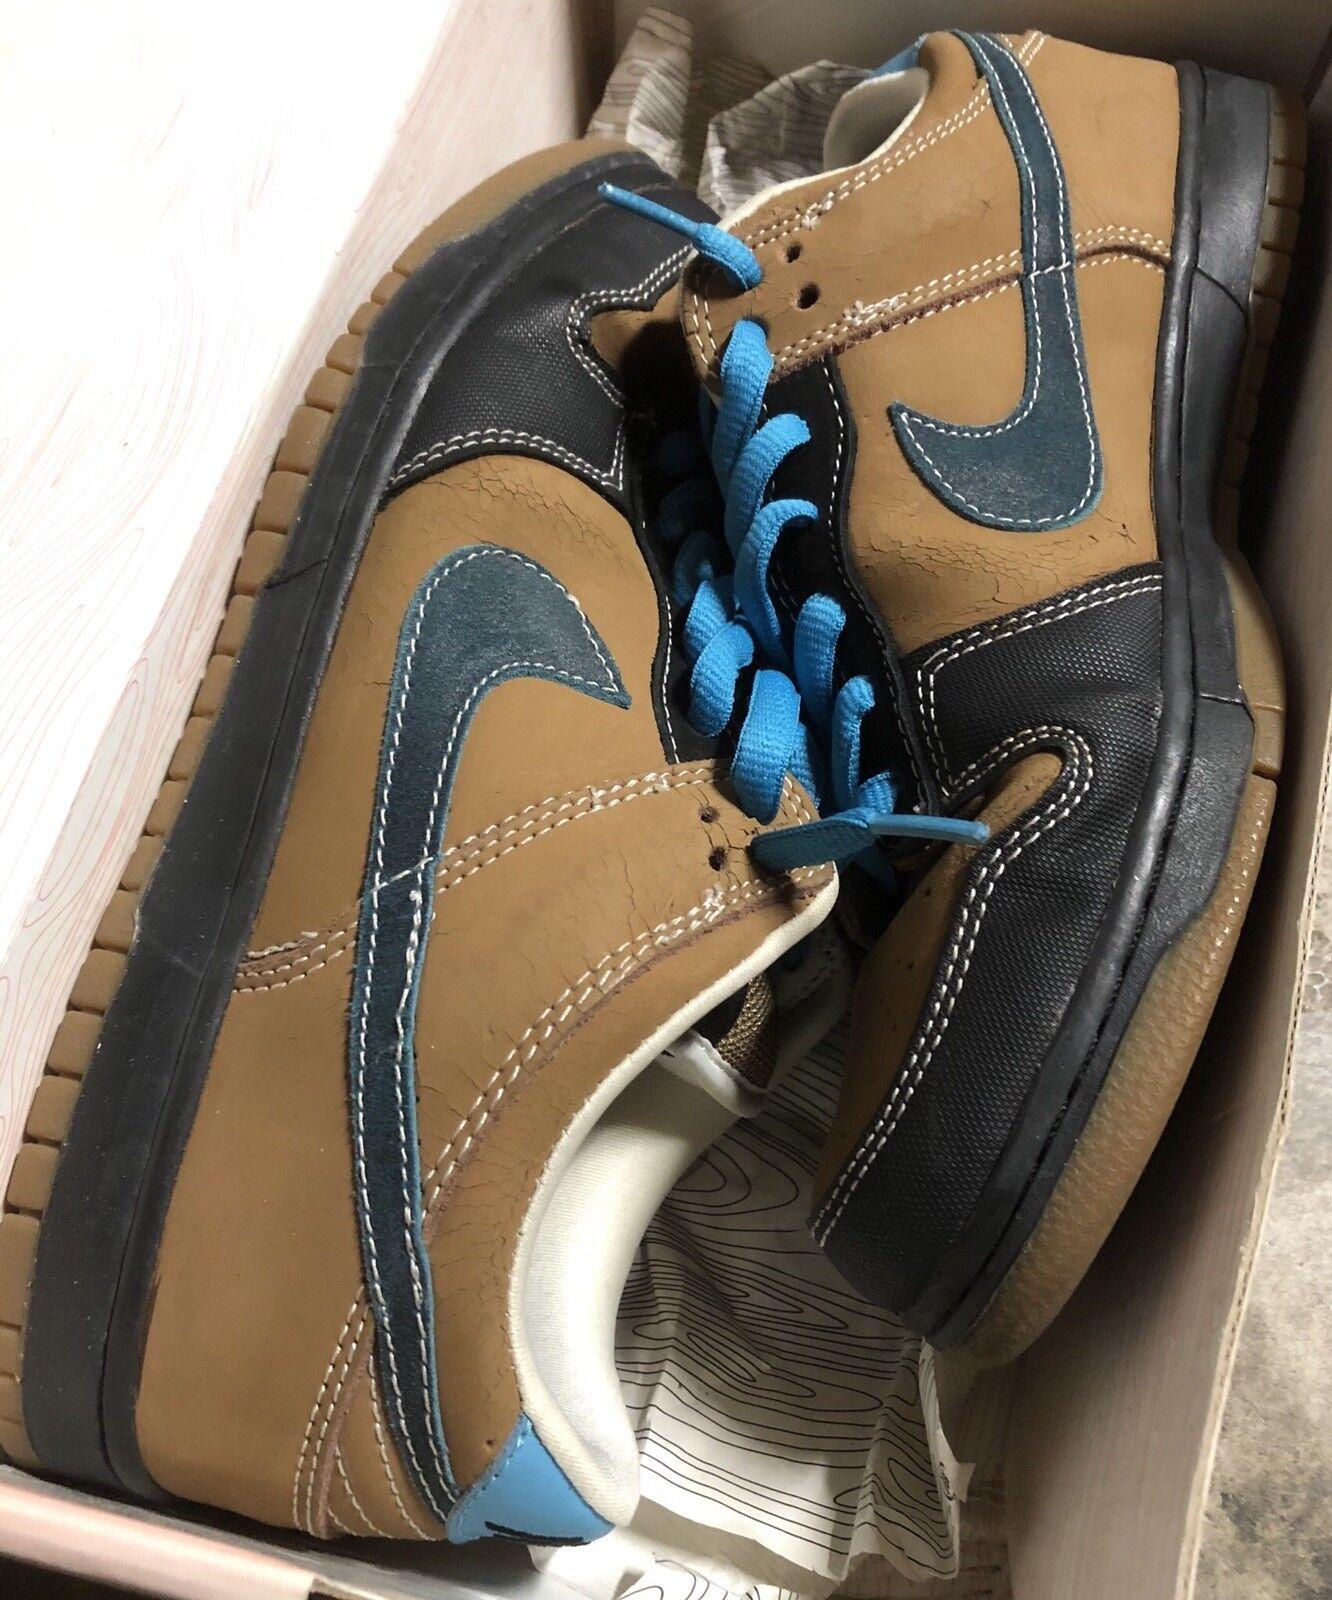 da7fd9efcf Nike Sb Dunk Low Low Low Premium Slam City Size 10 09bf52 - boots ...